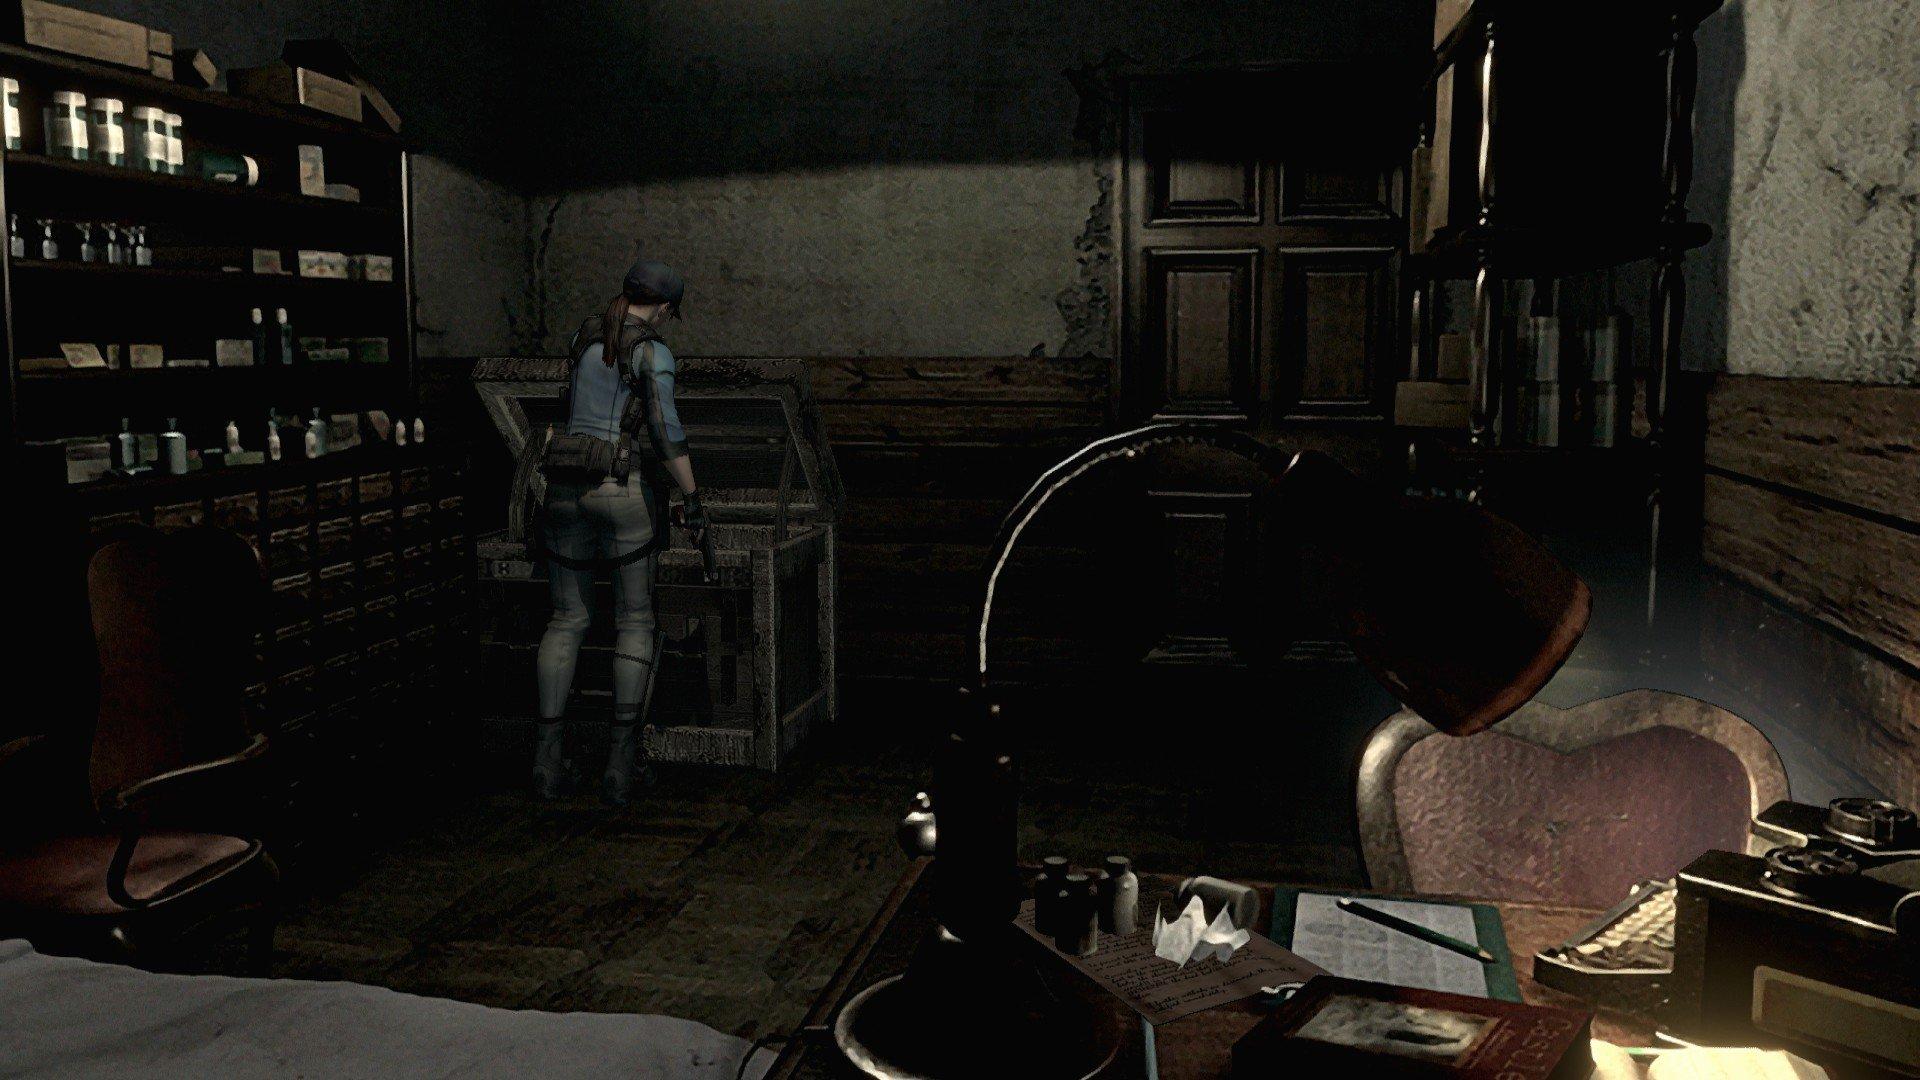 Comment déposer des objets dans Resident Evil HD Remaster